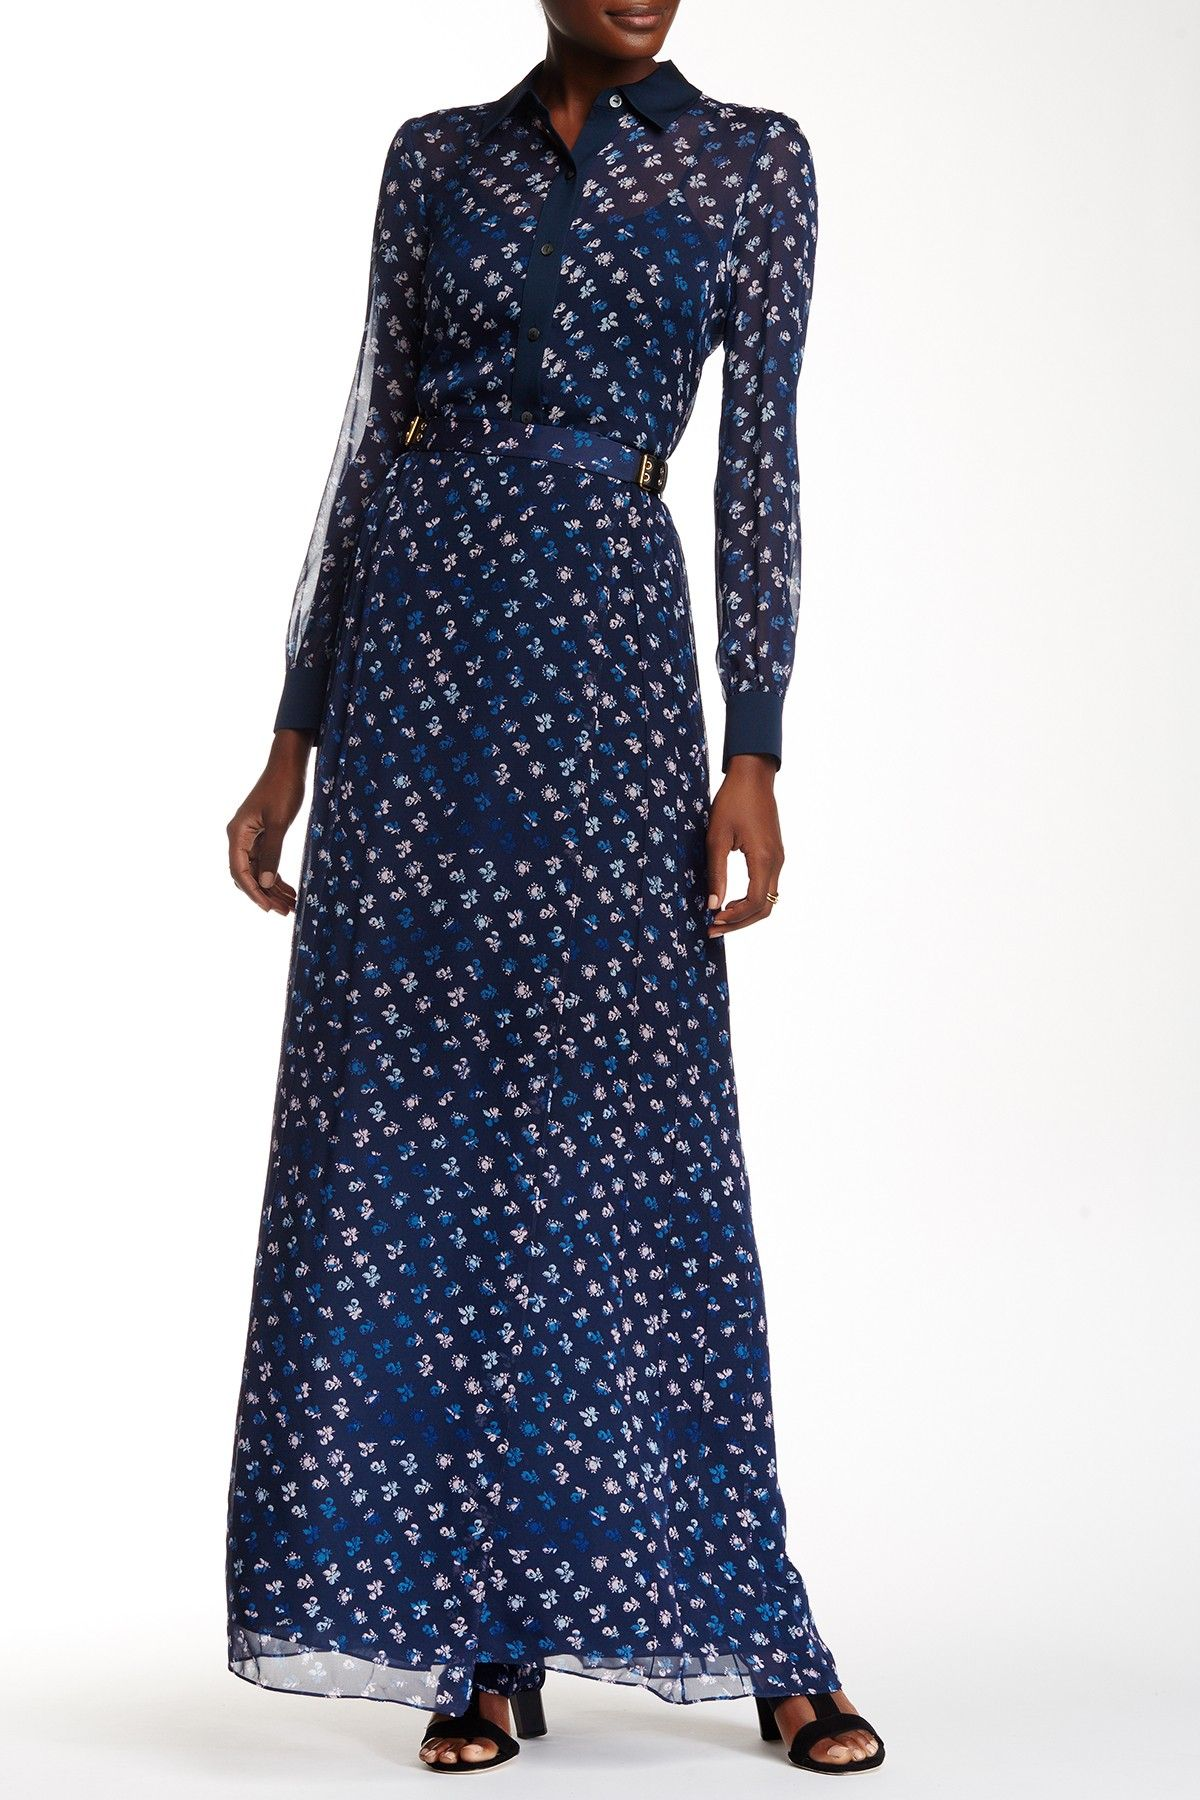 Diane von Furstenberg - Bethune Print Silk Wrap Maxi Skirt at Nordstrom Rack…